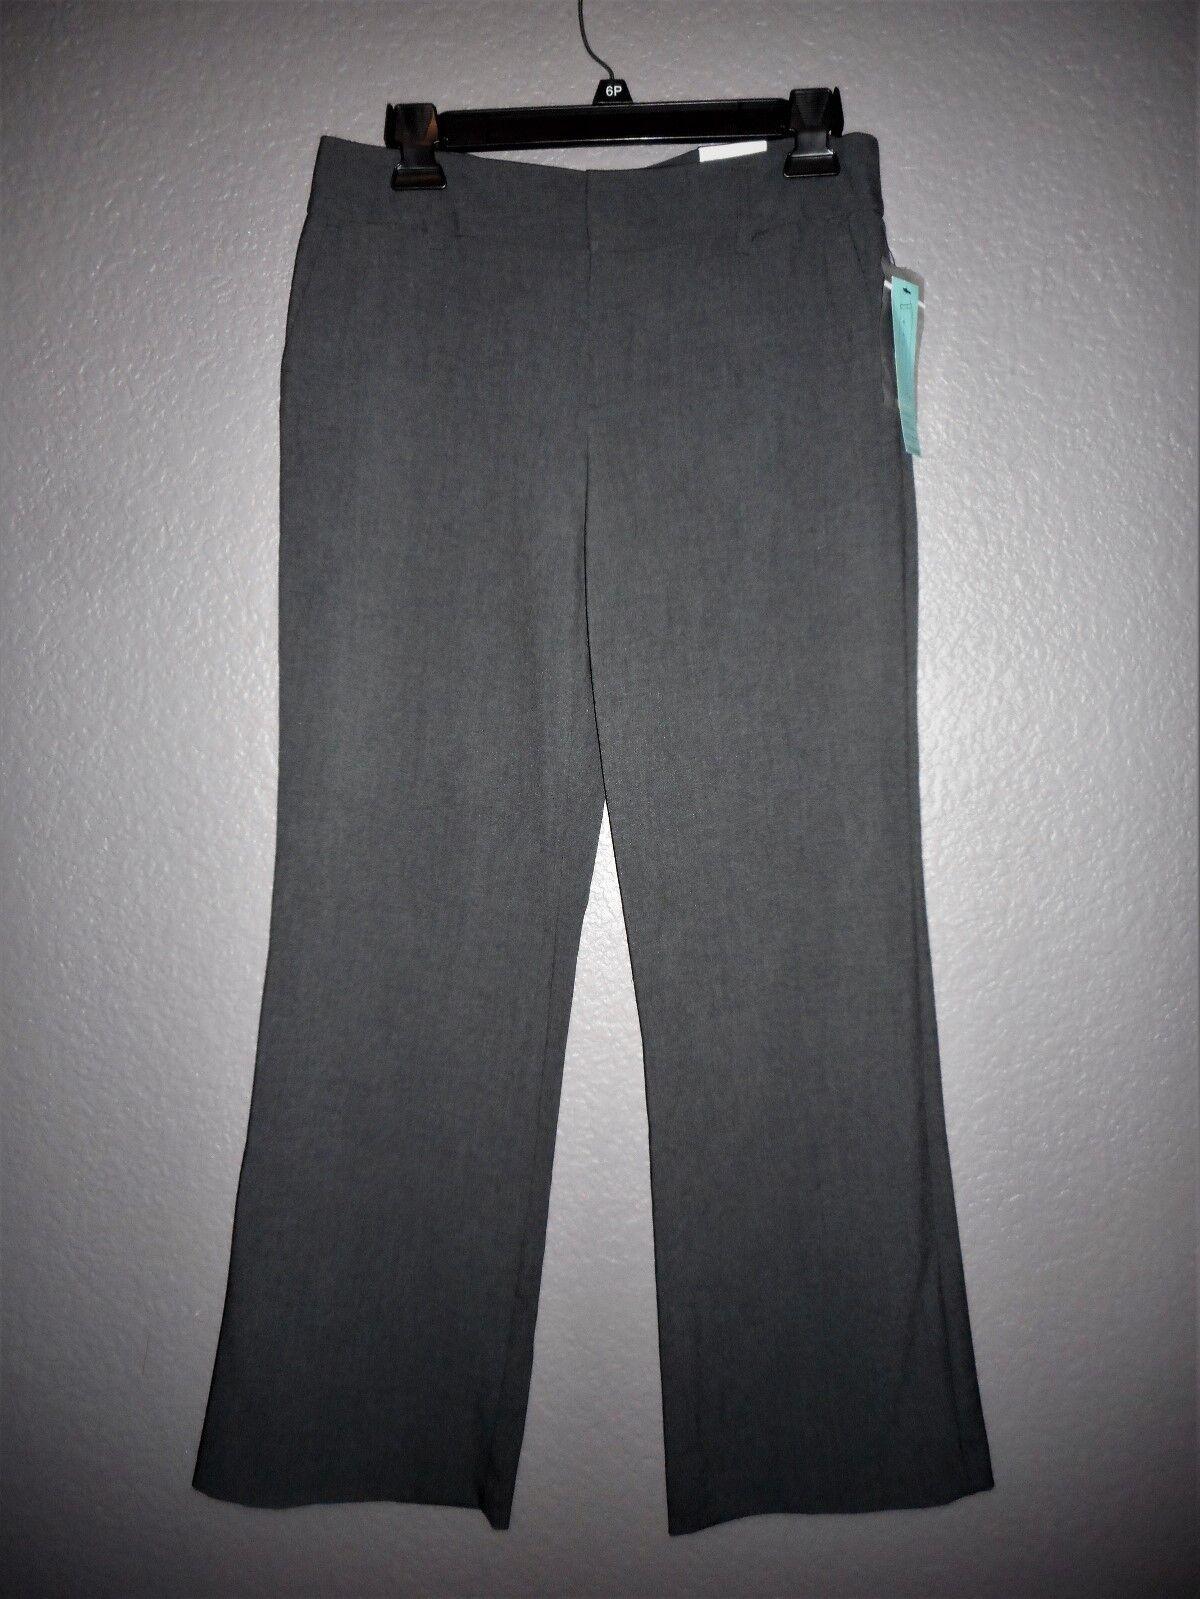 Lane Bryant CLASSIC Trouser Plus Size 26P 26 Petite 4X DARK GRAY Dress Pants NWT